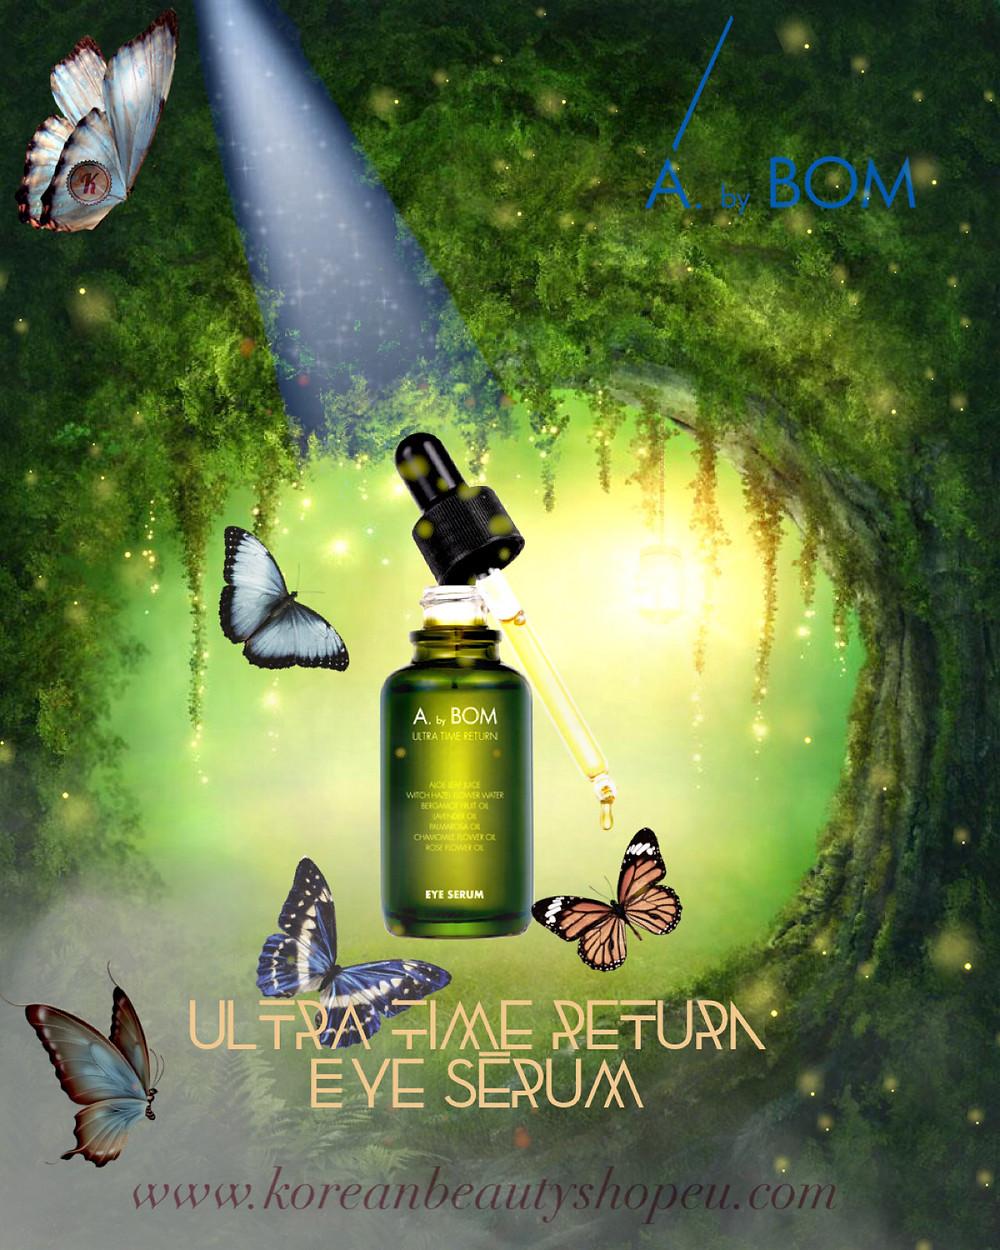 A by Bom Ultra Time Return Eye Serum @ Korean Beauty Shop EU